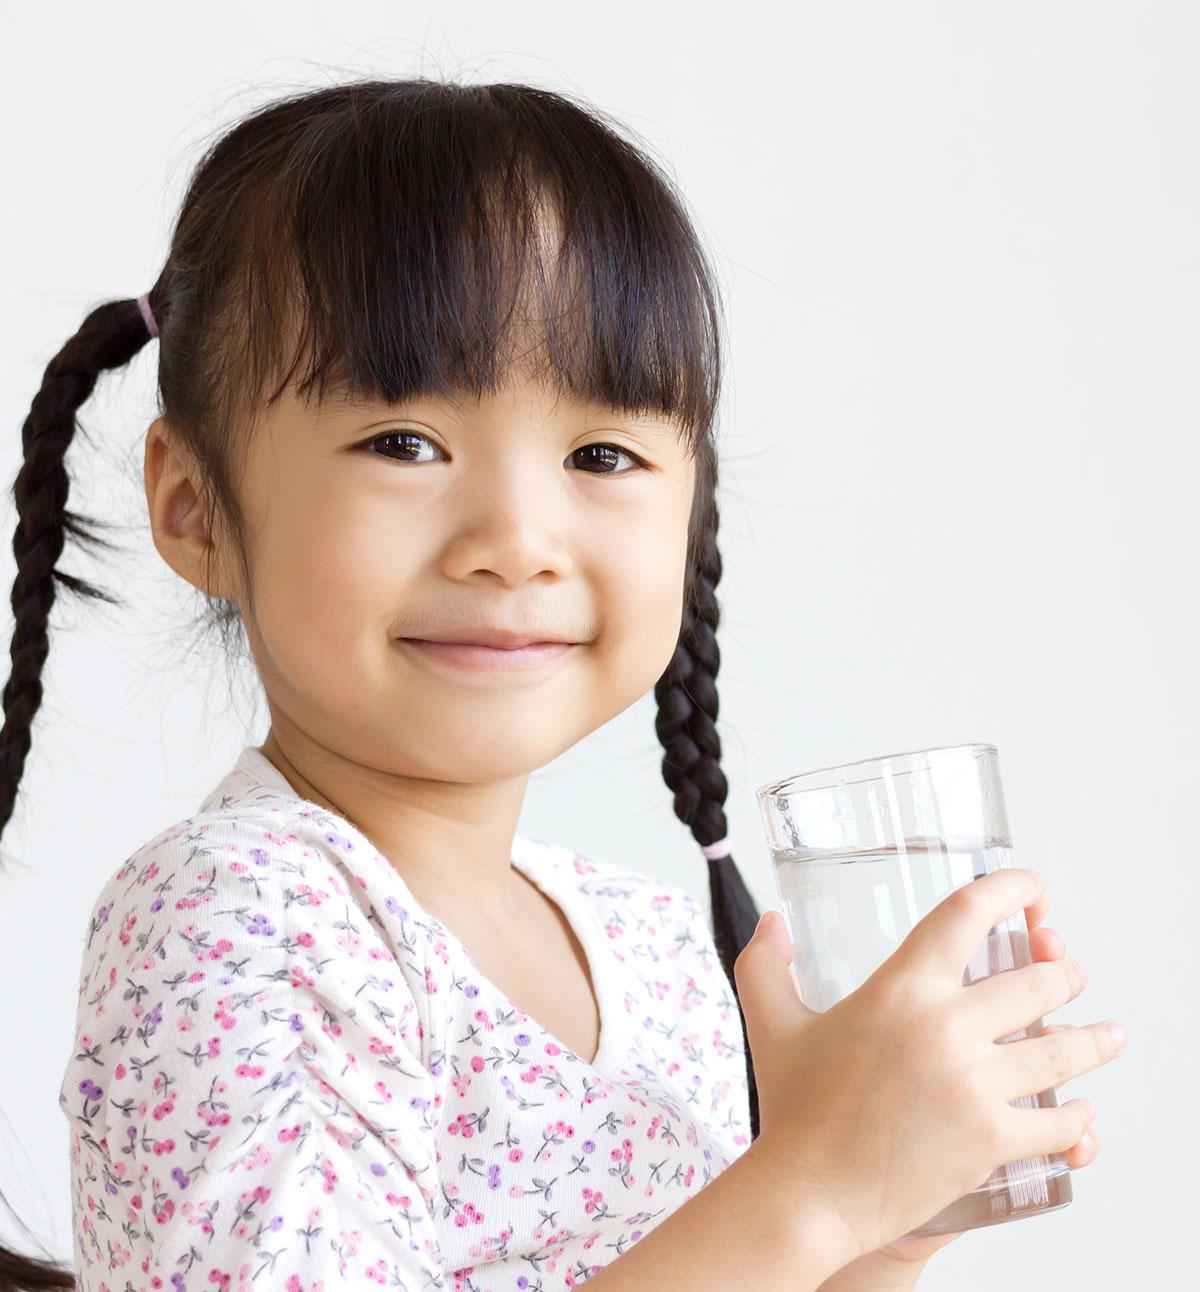 B4School FUN - Alphabet Adventure - W is for Water